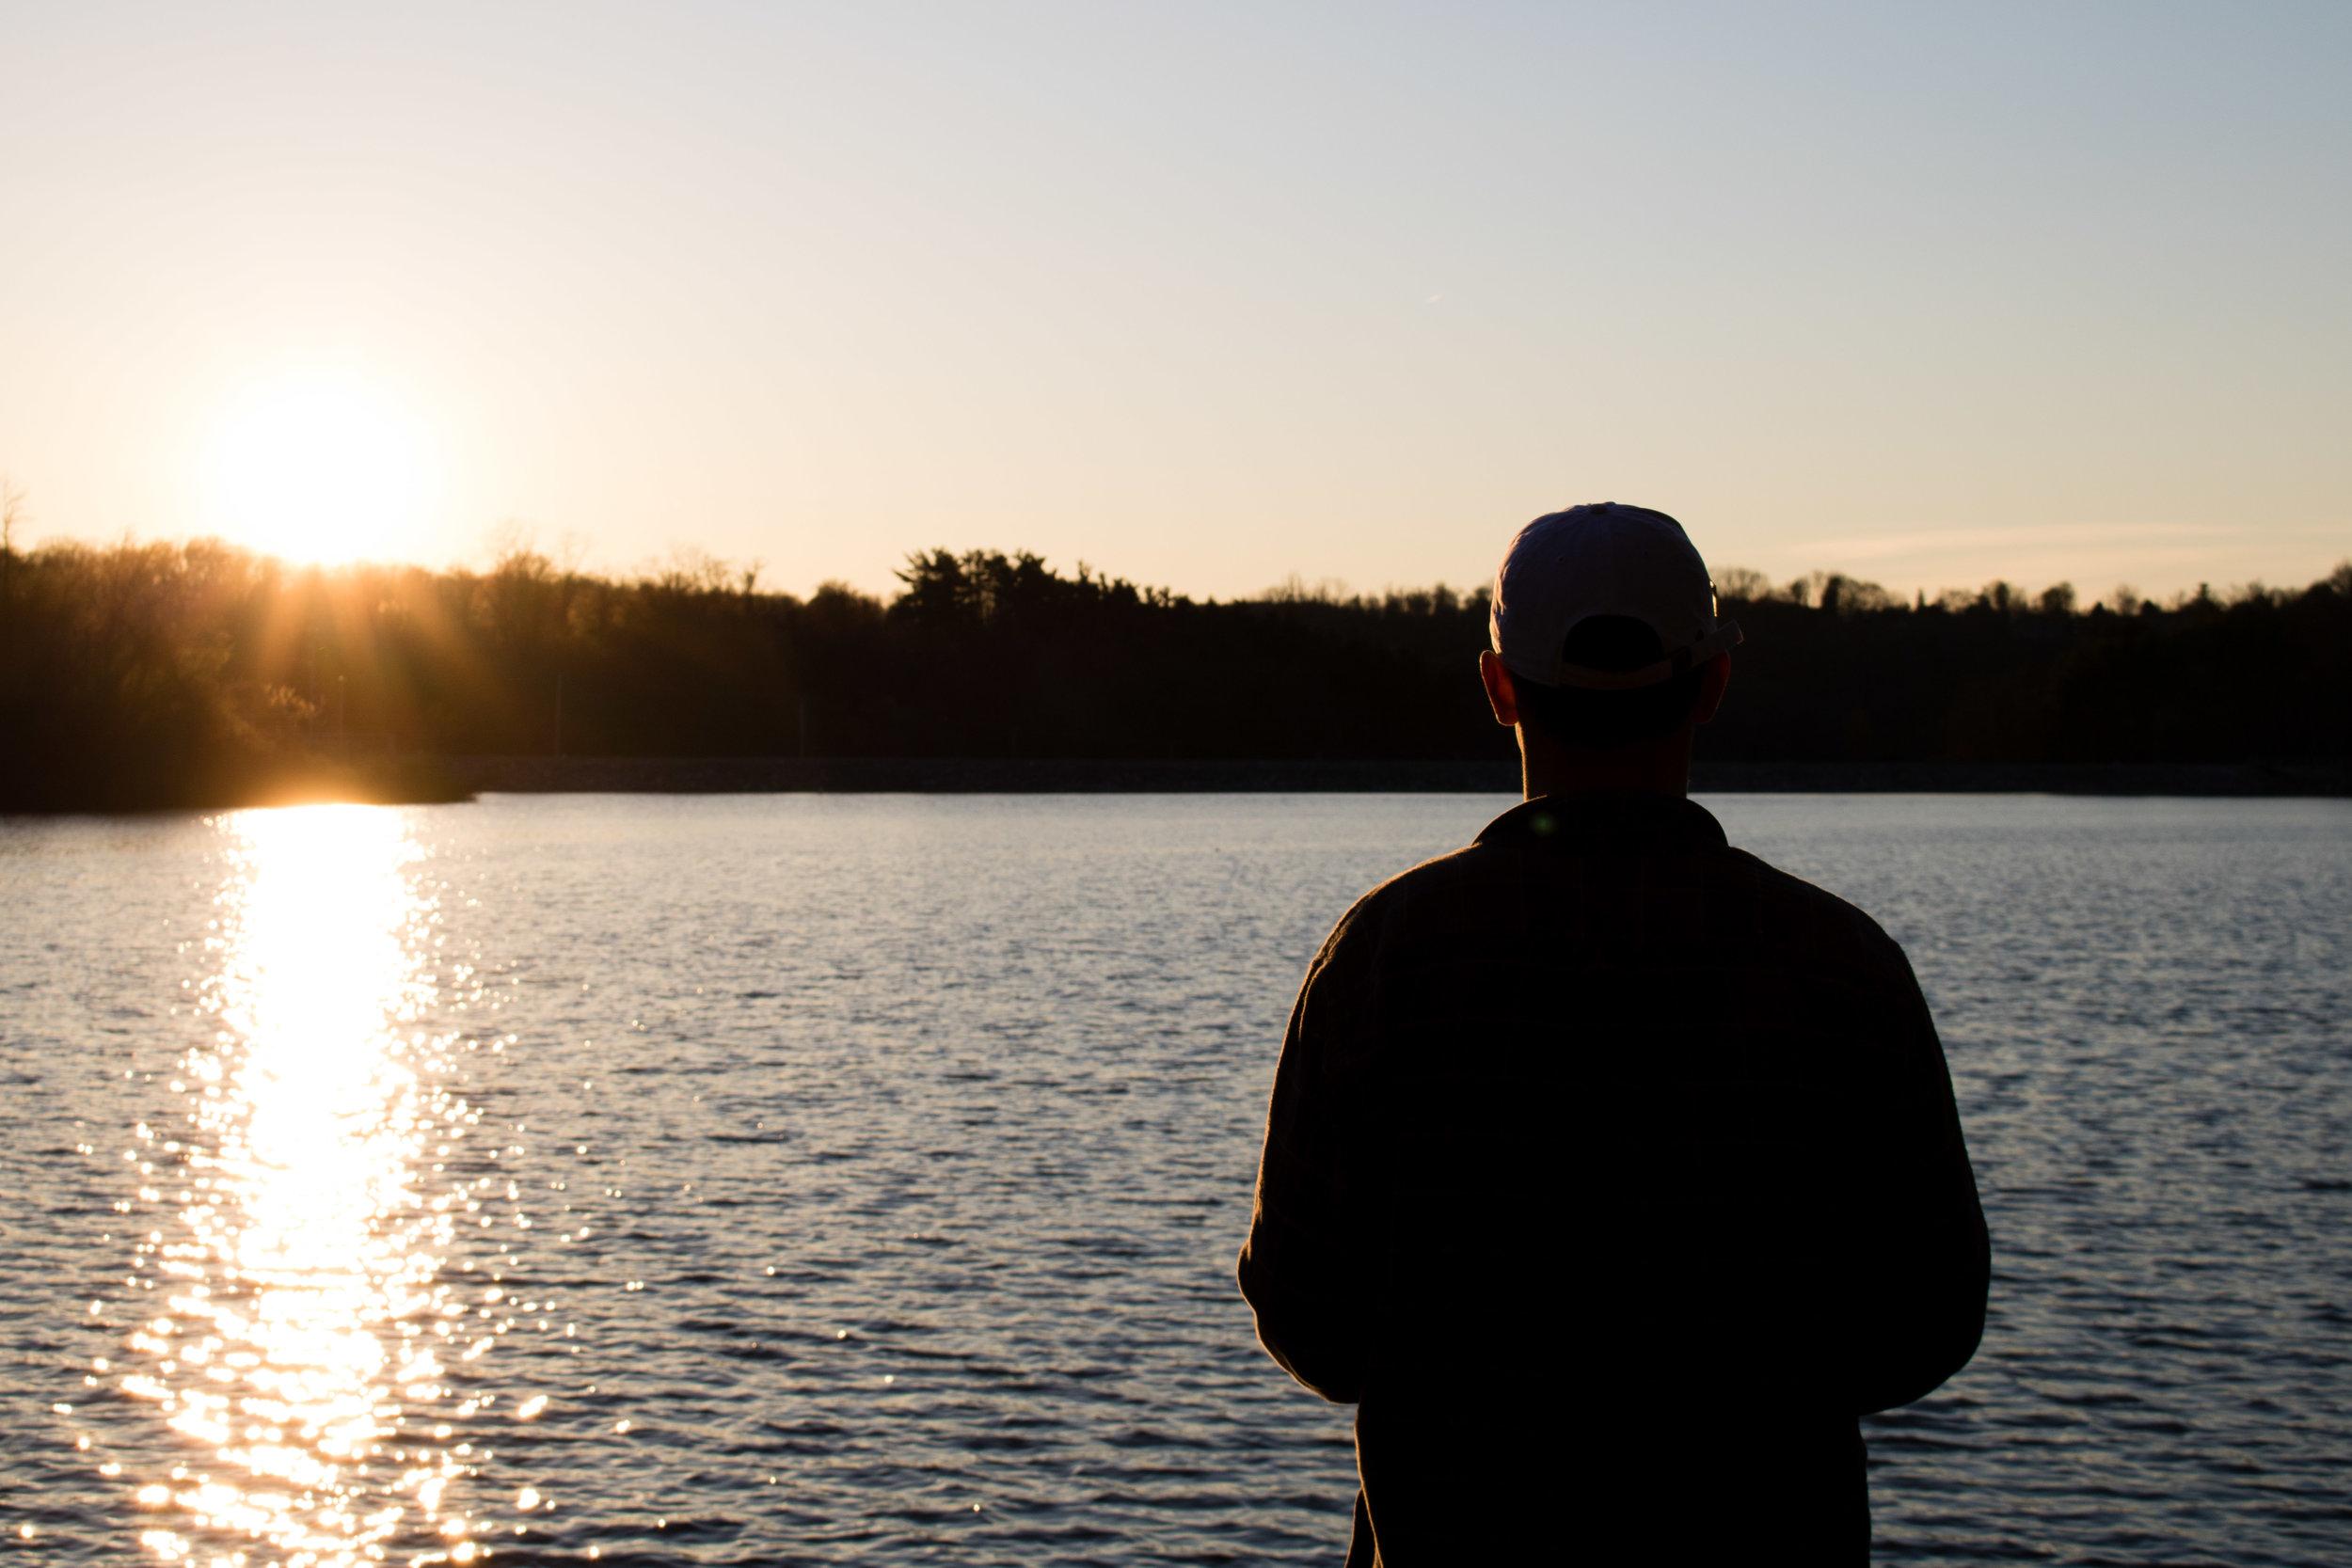 Silhouette-Sunset-Lake-Redman-Jacobus-Pennsylvannia-Photography